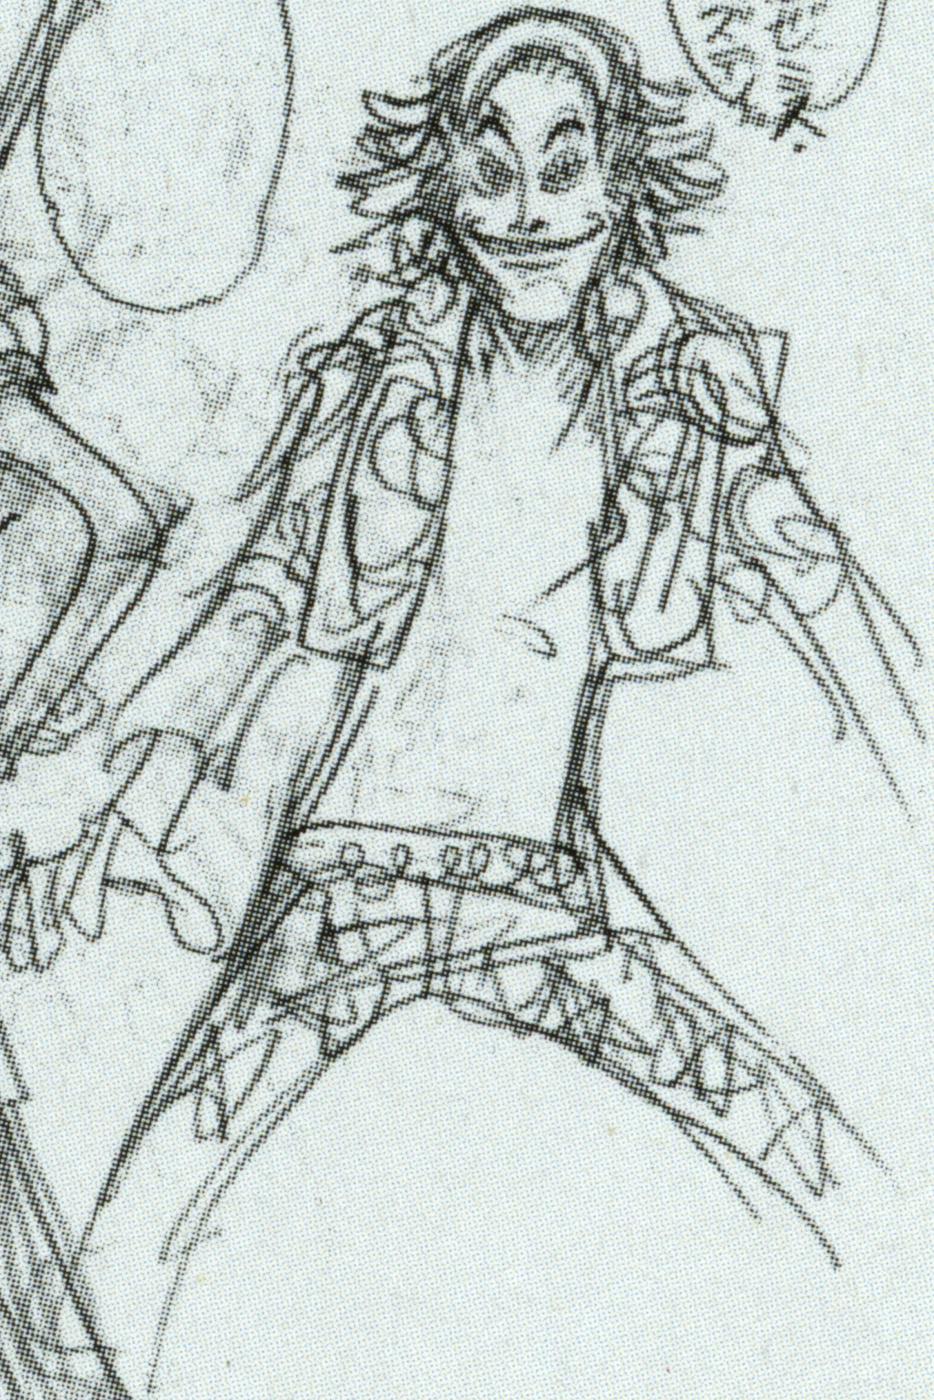 Mr. 10 Manga Infobox